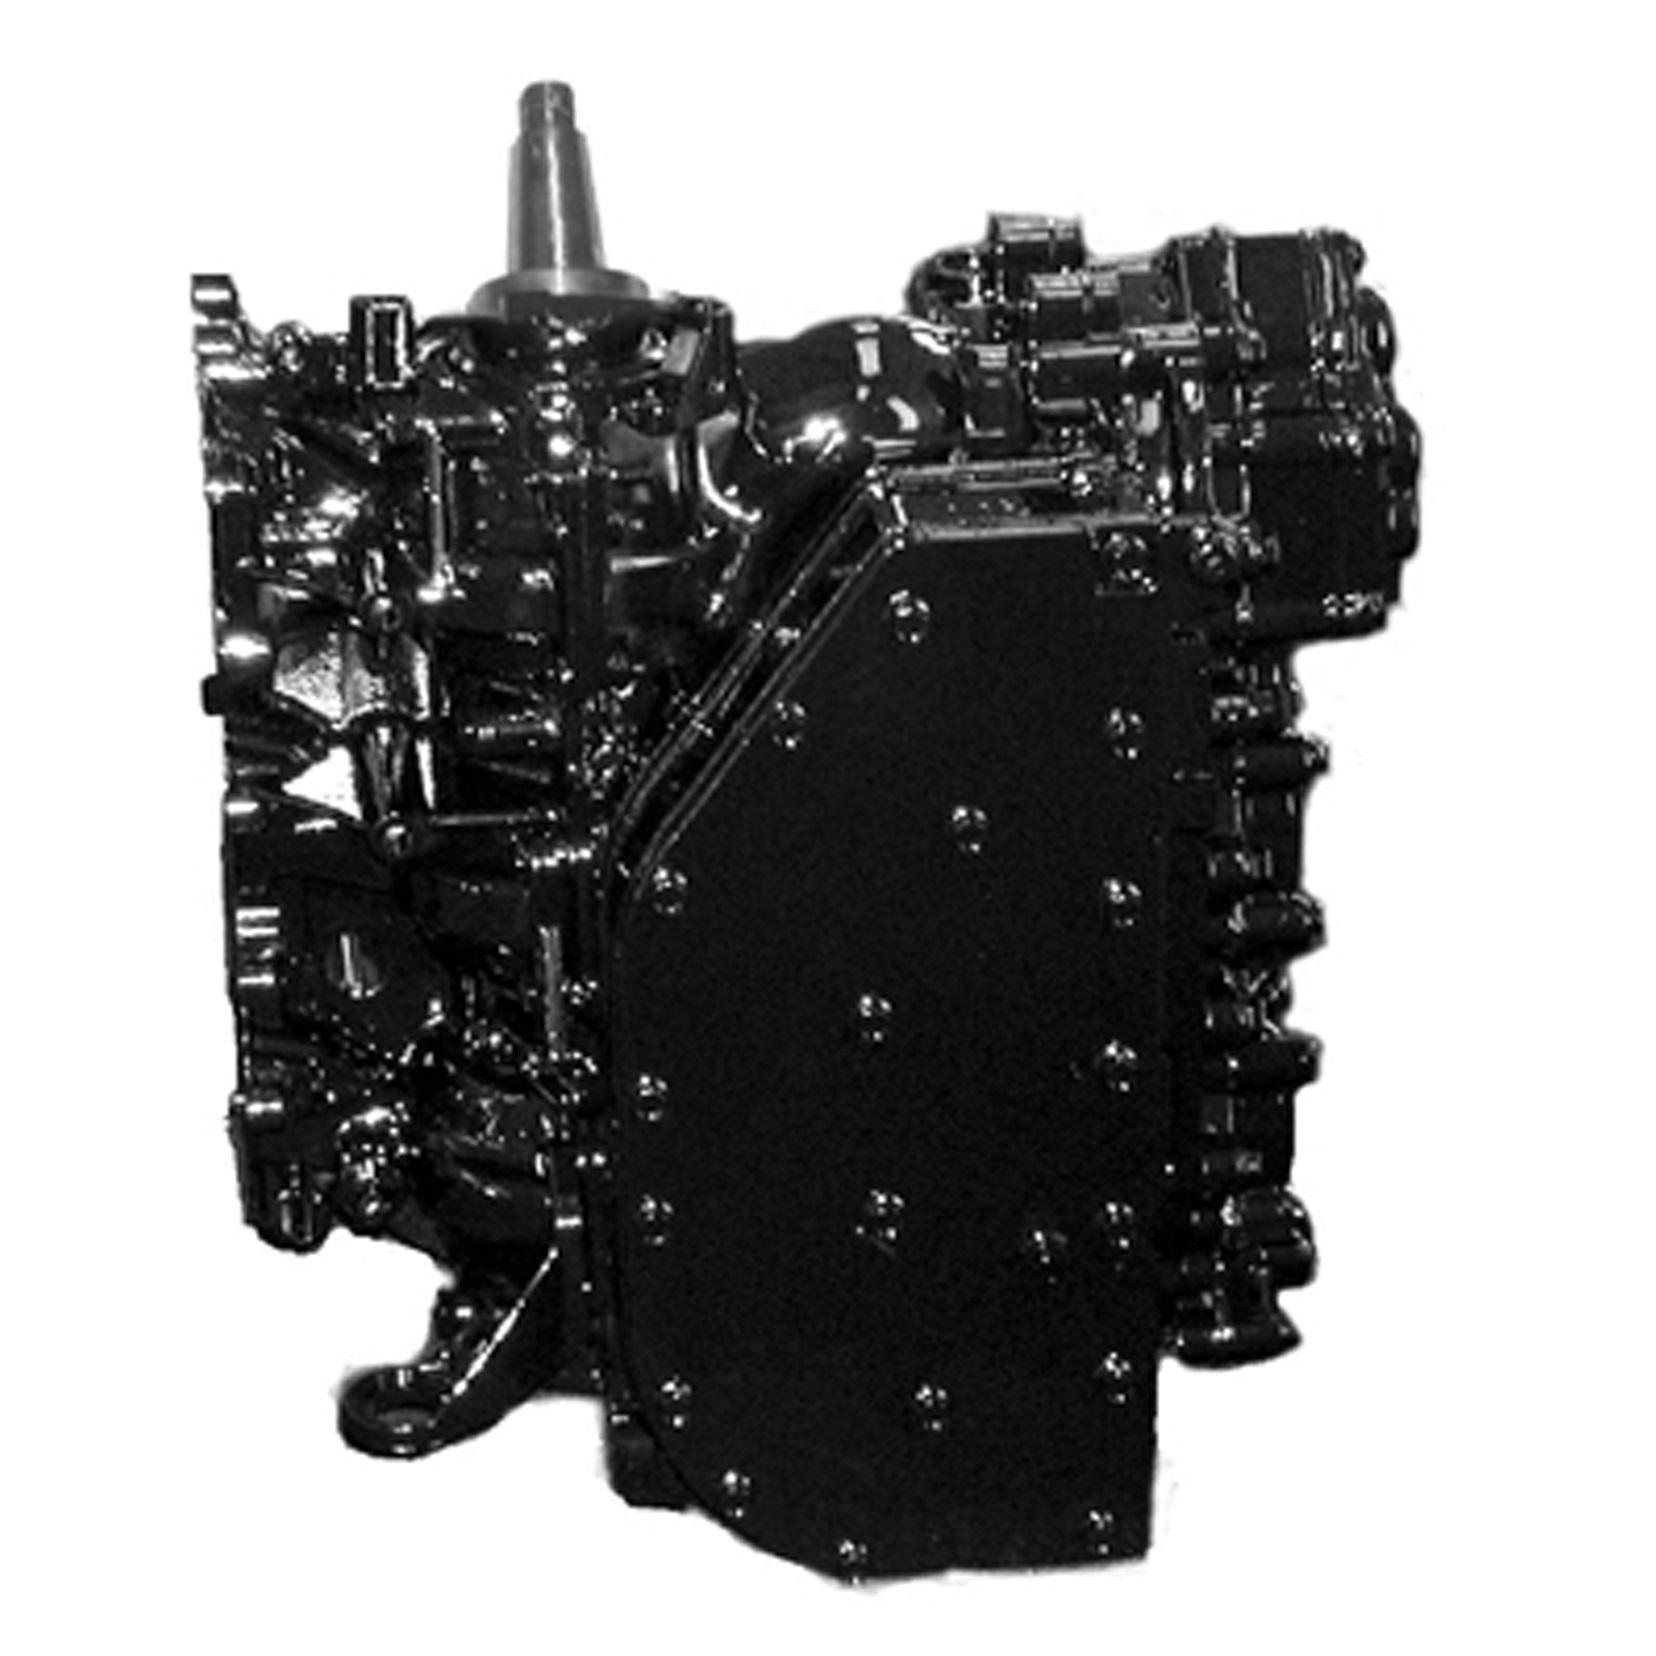 je-3-cyl-complete-powerhead-1989-2001.jpg